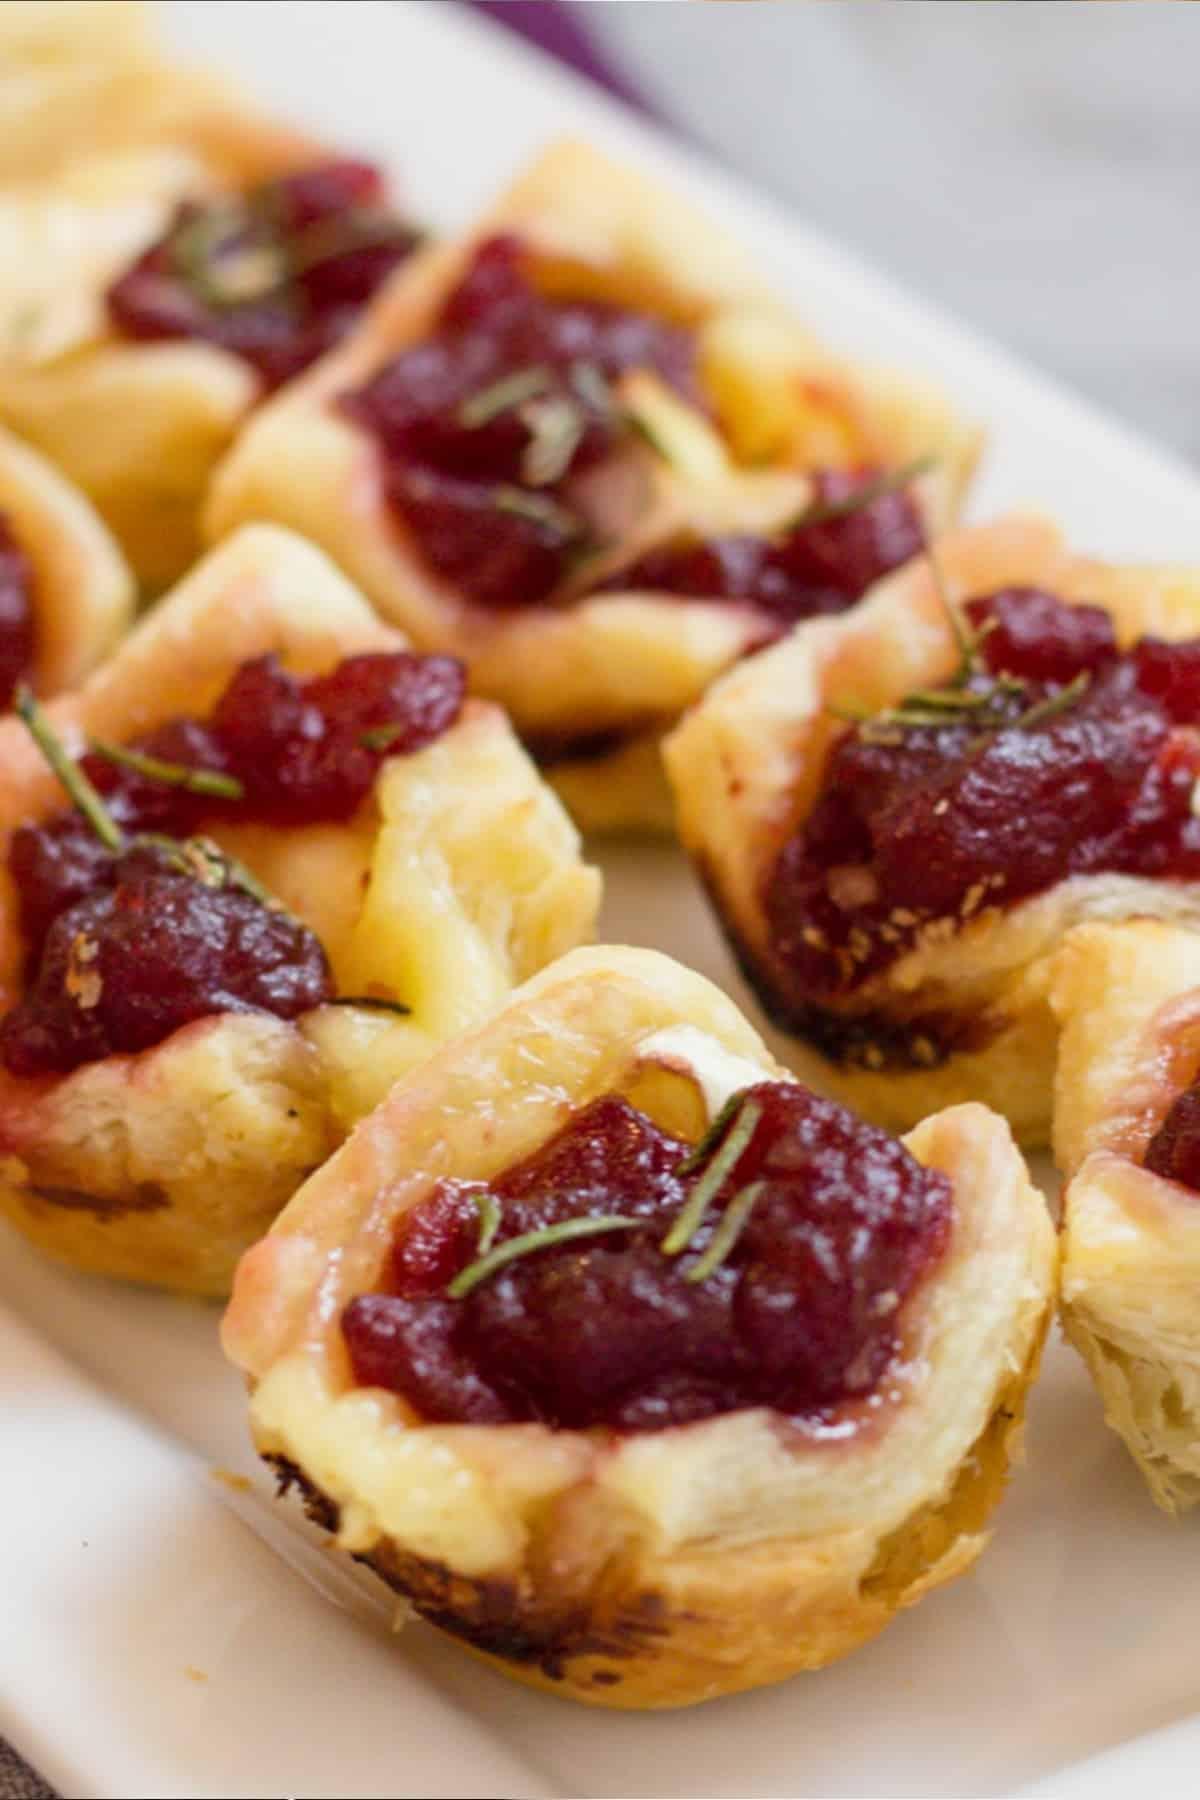 Cranberry brie bites on a platter